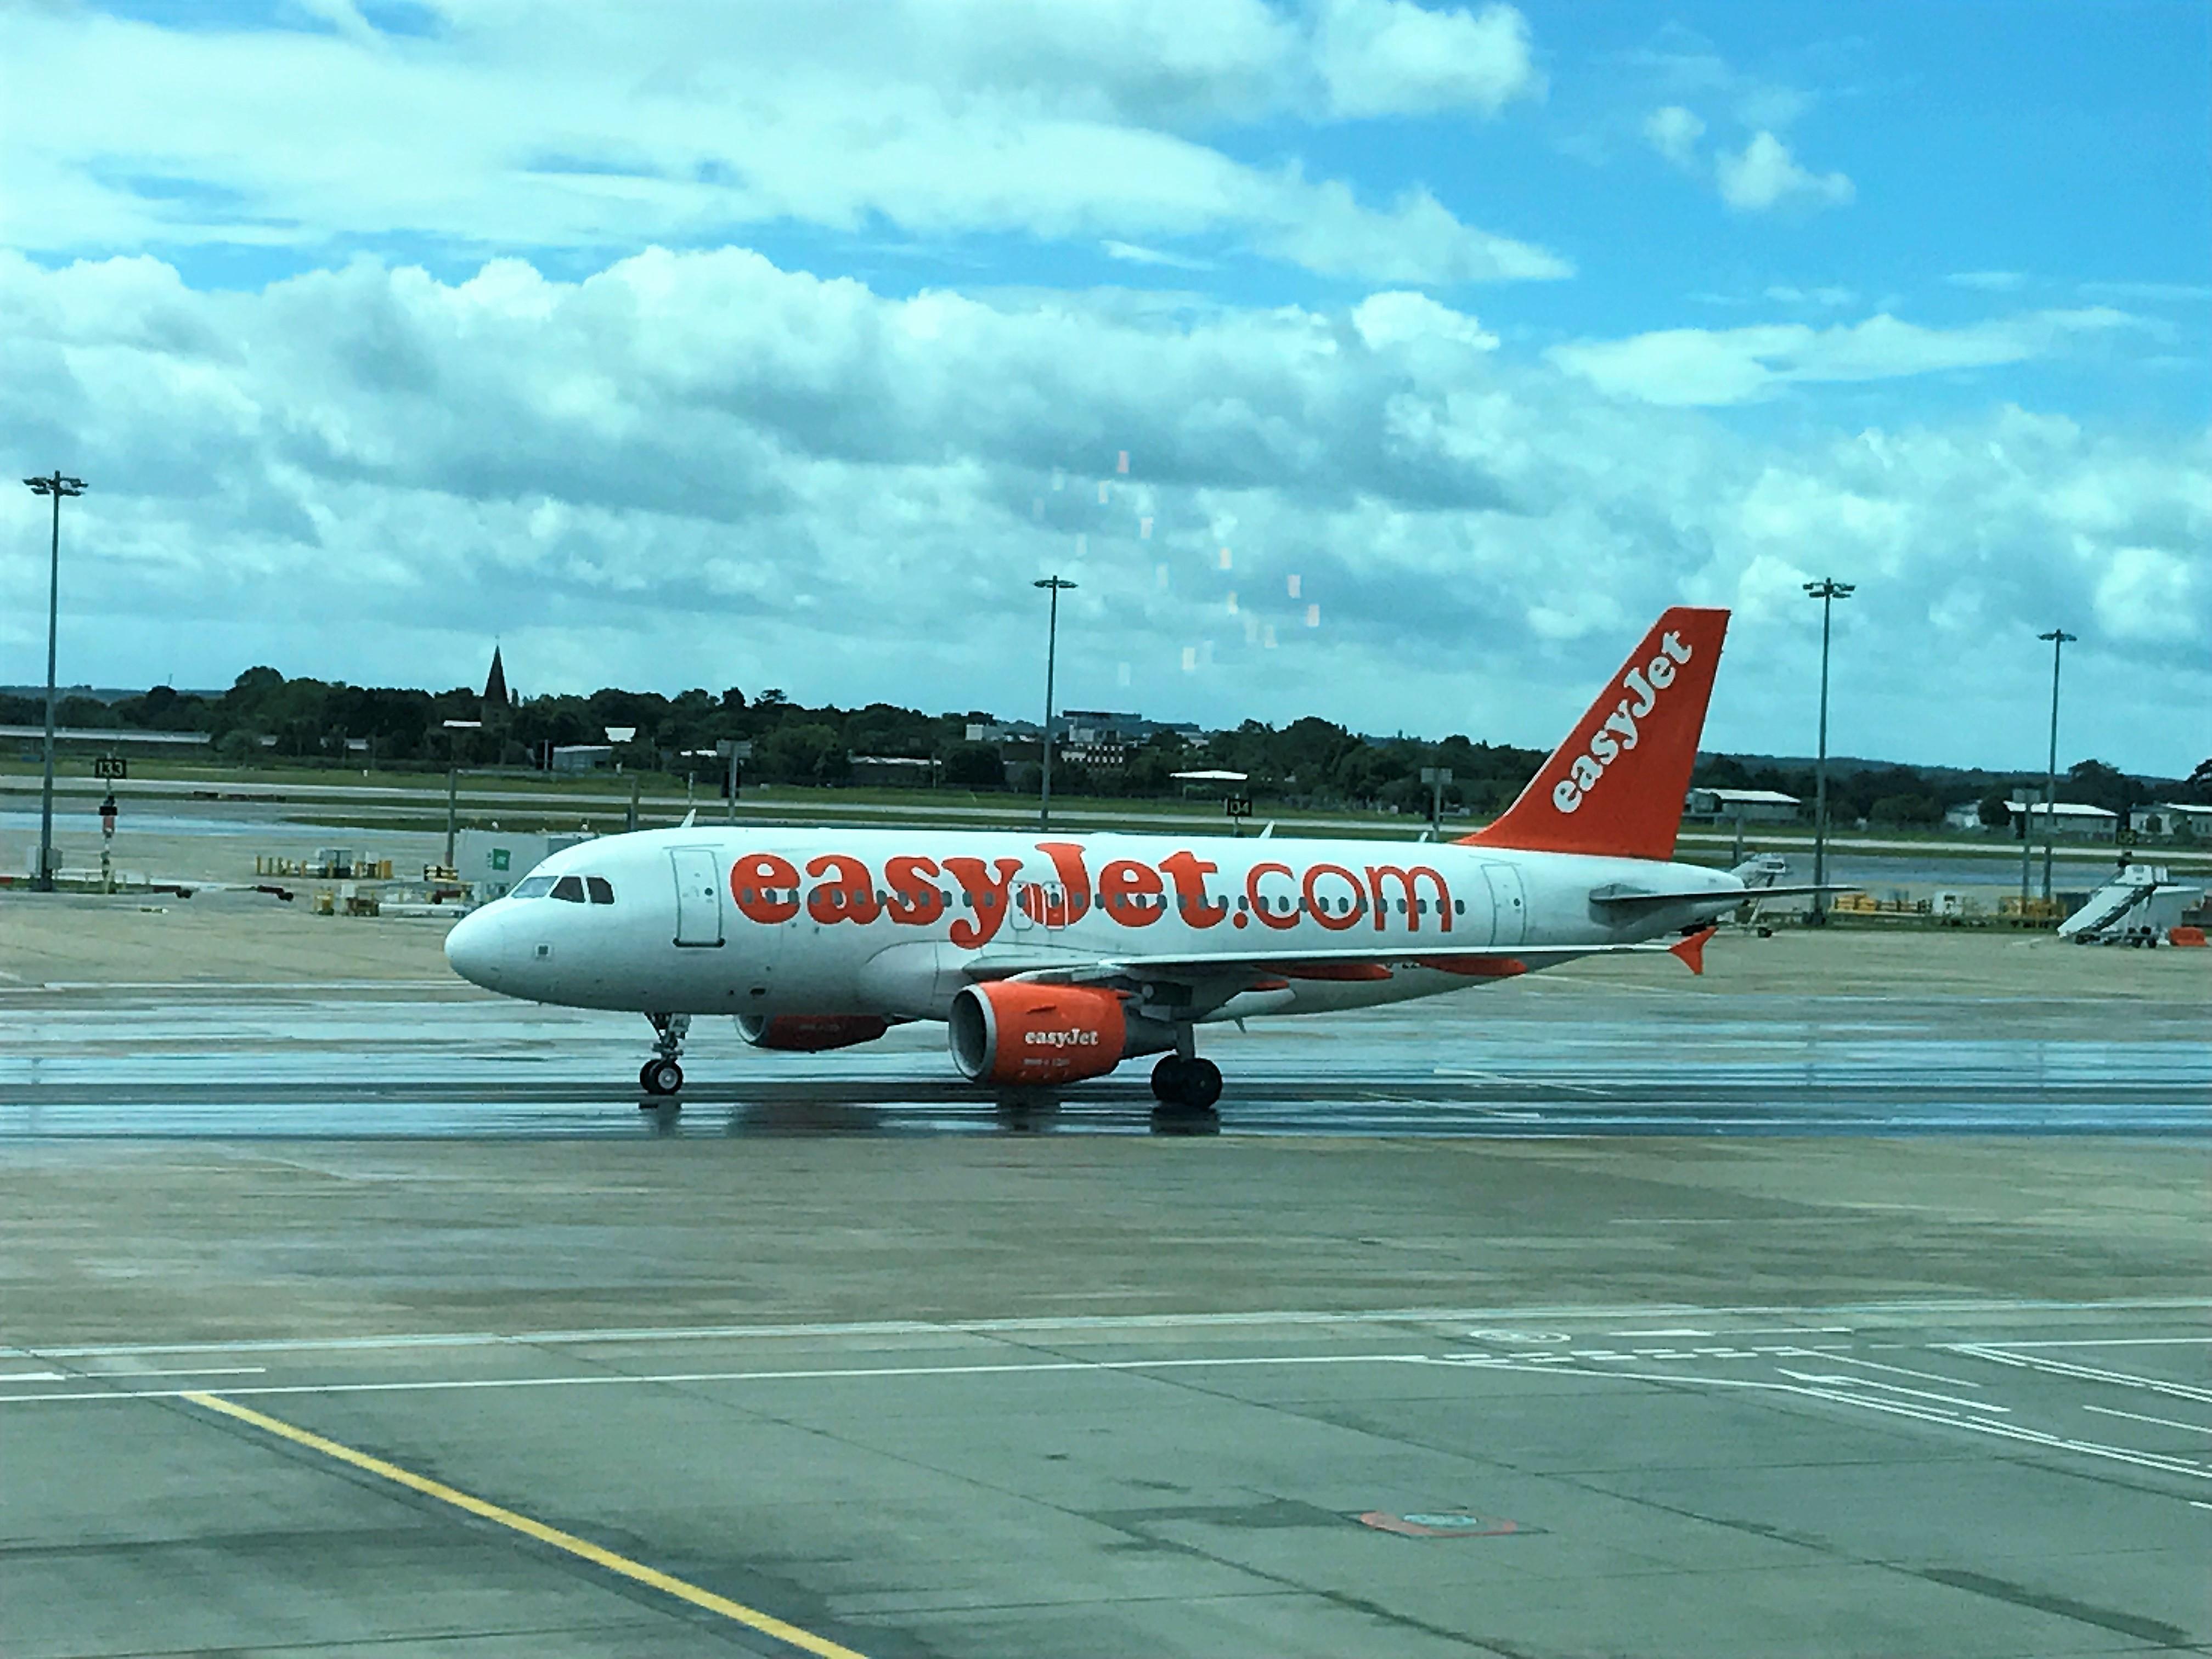 easyjet flights - photo #16